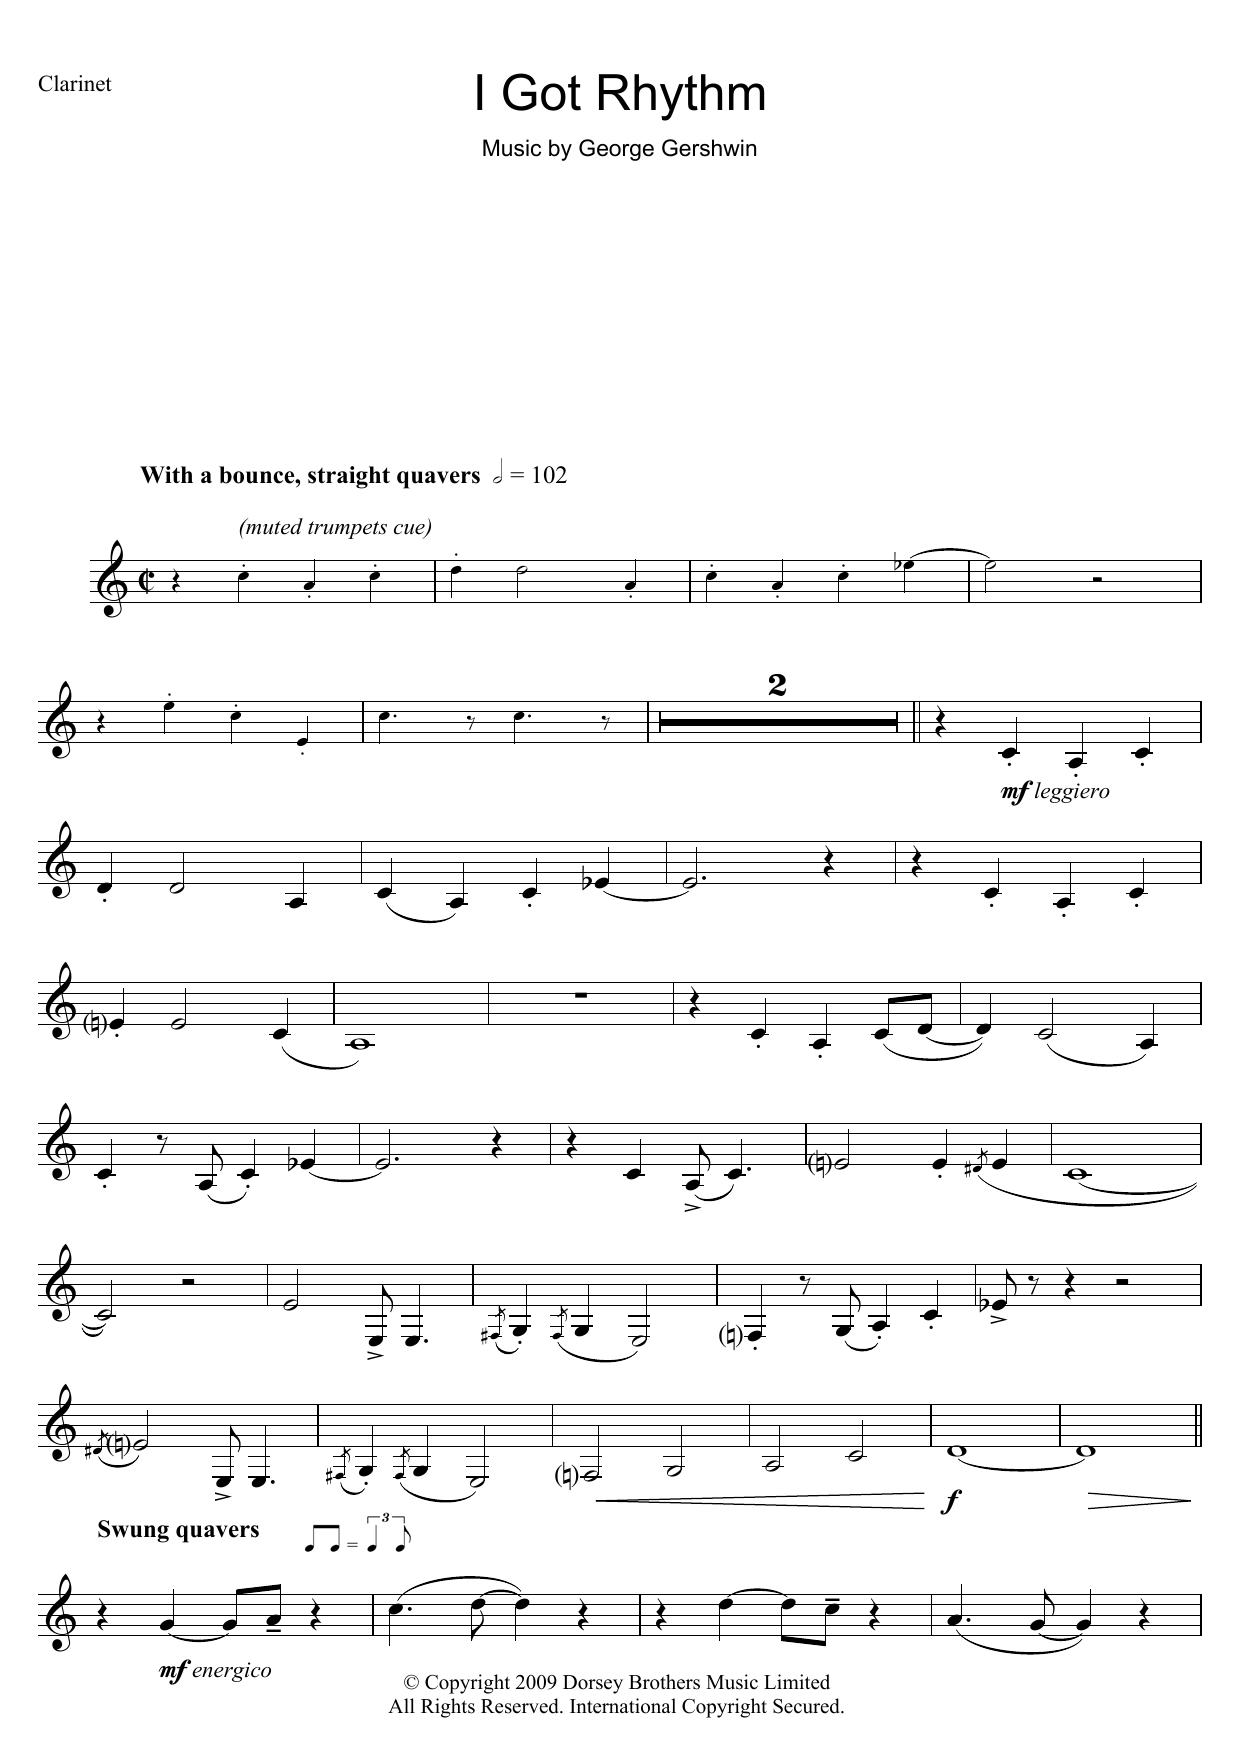 I Got Rhythm Sheet Music